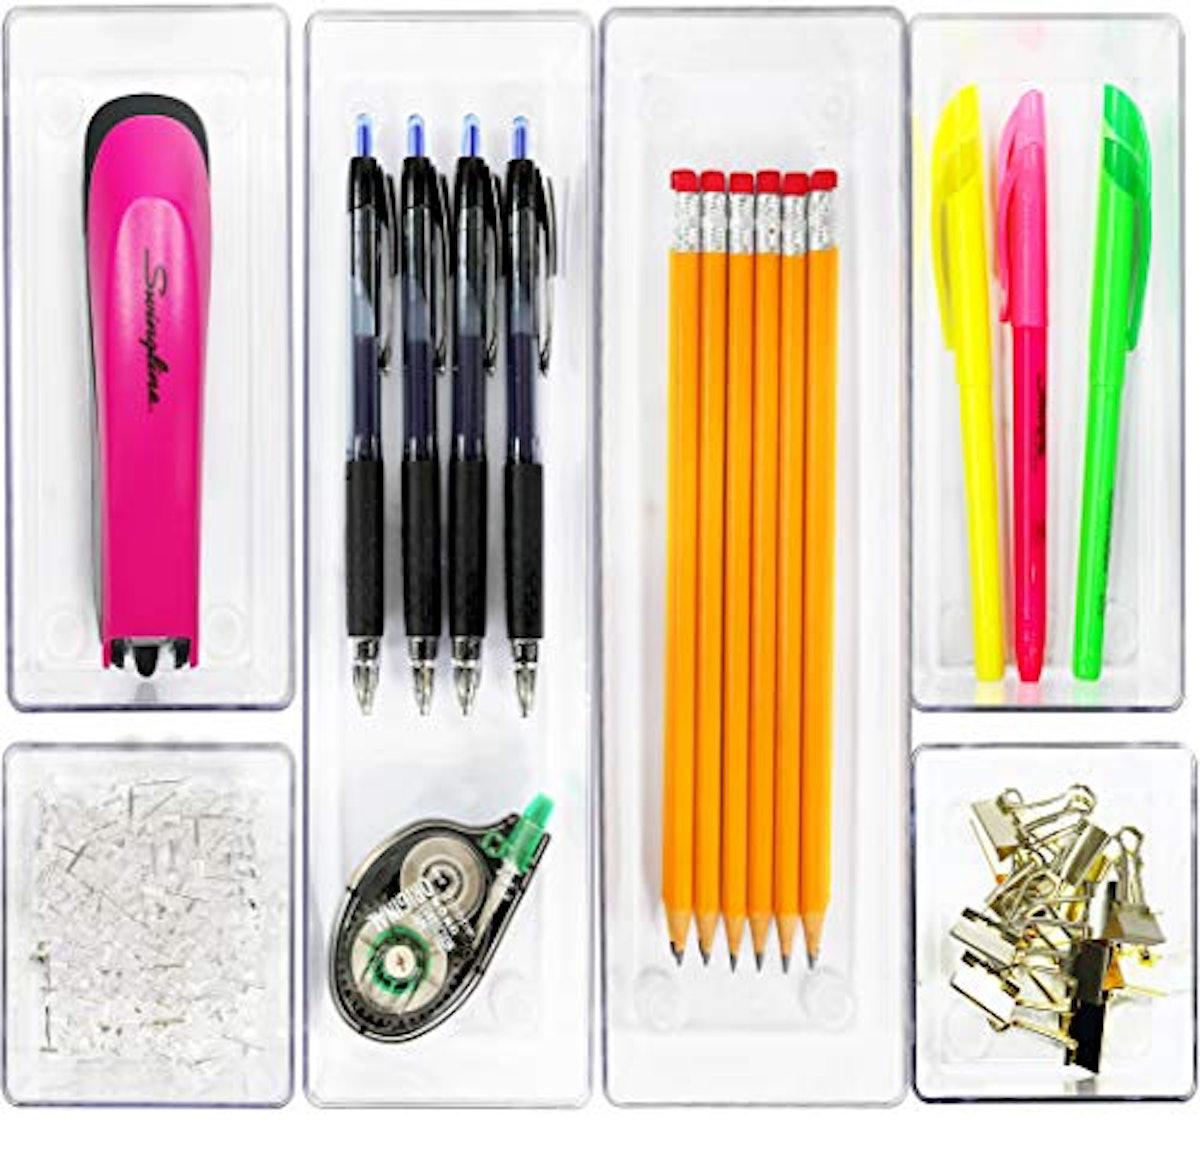 Simple Houseware Clear Plastic Desk Drawer Organizers